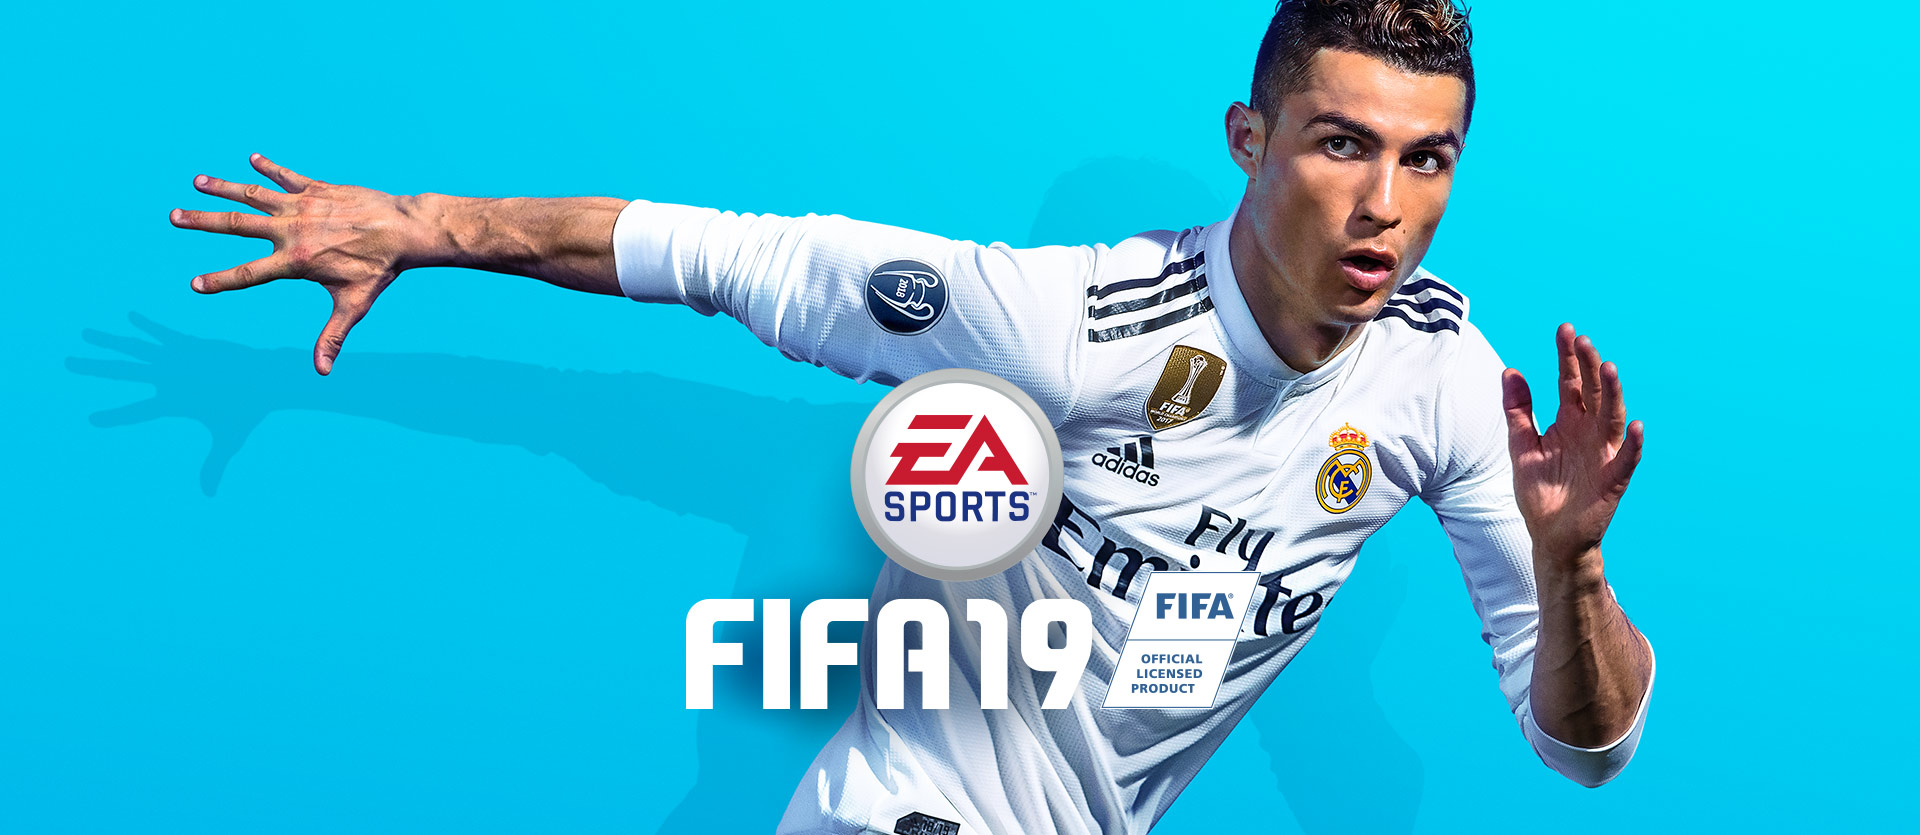 EA Sports FIFA 19, Cristiano Ronaldo a correr